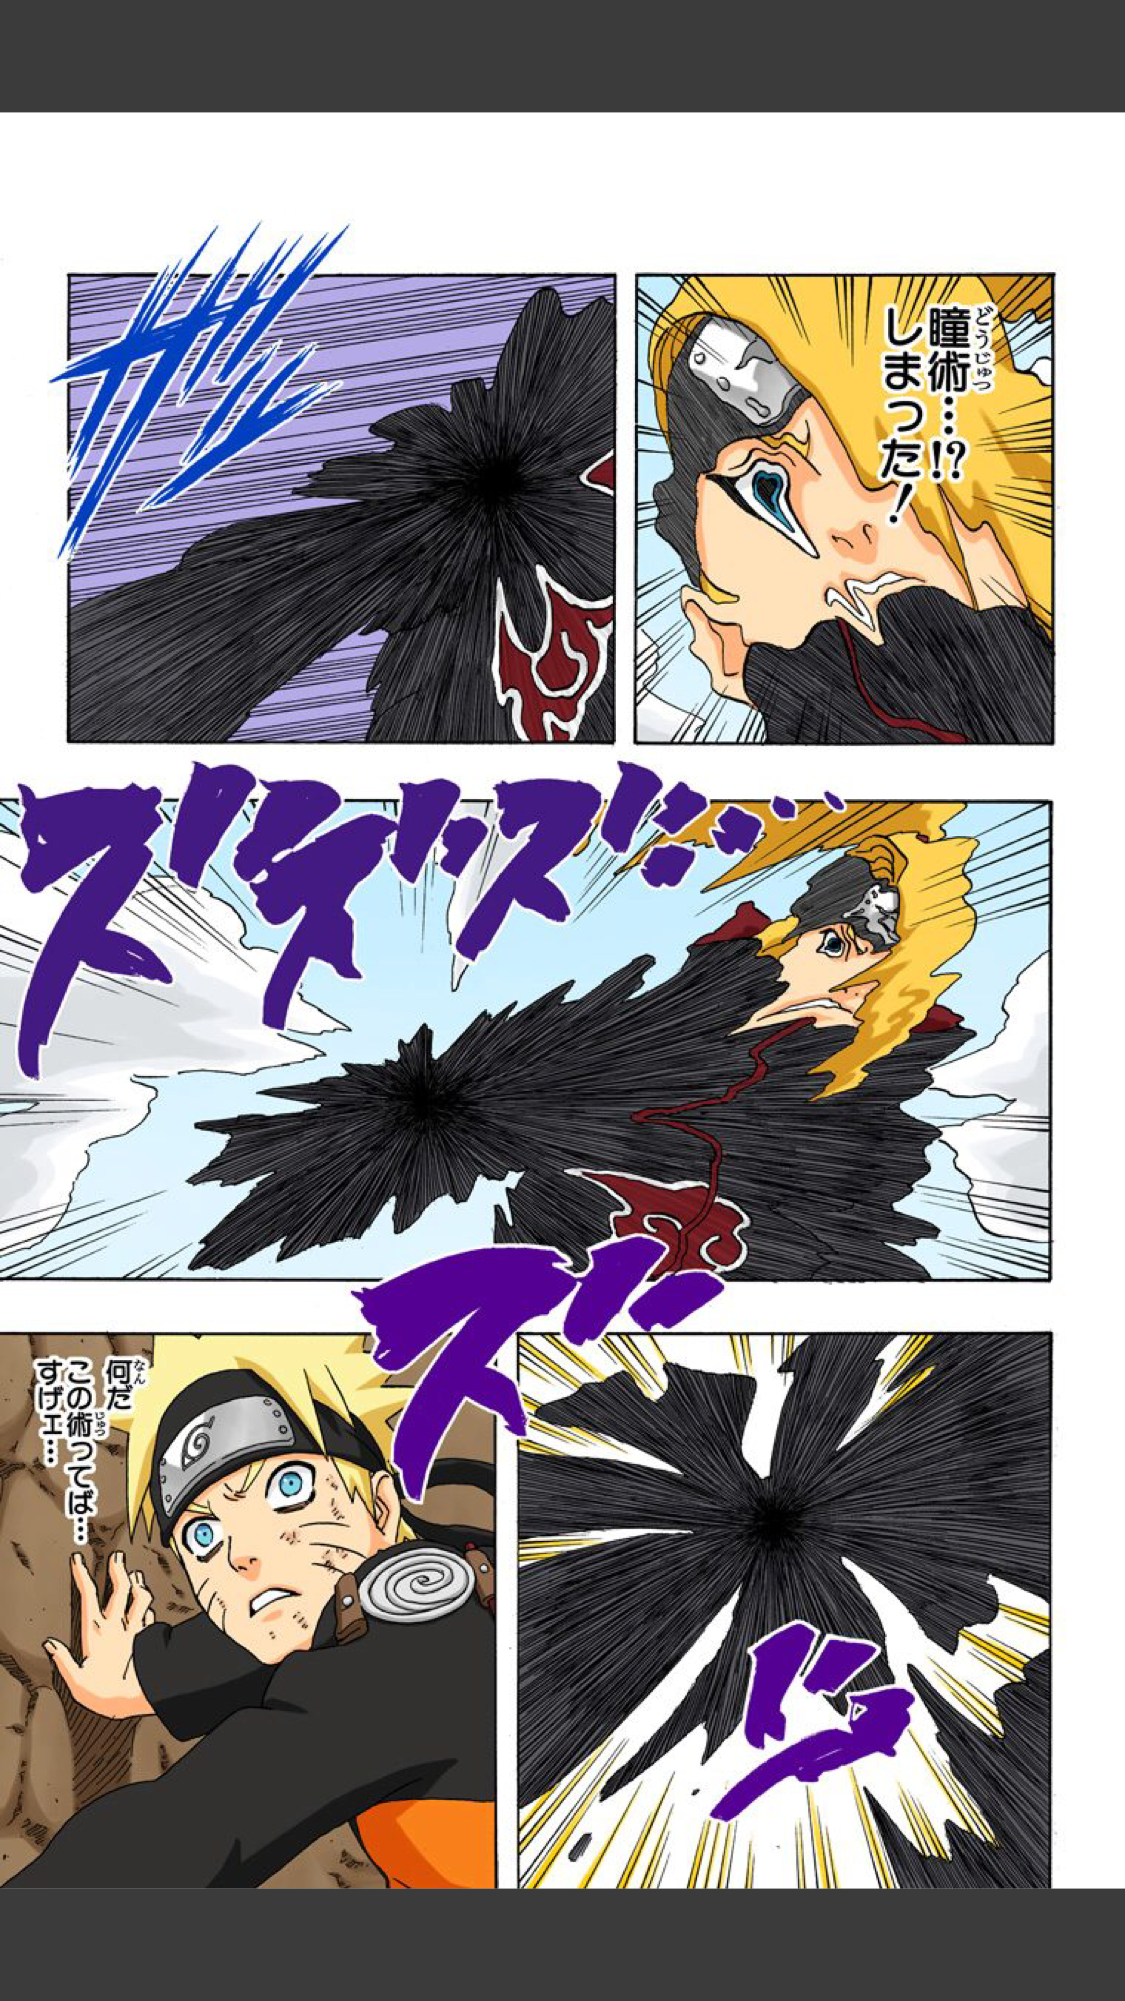 Pin de H One-piece em Goku   Anime naruto, Naruto mangá, Anime